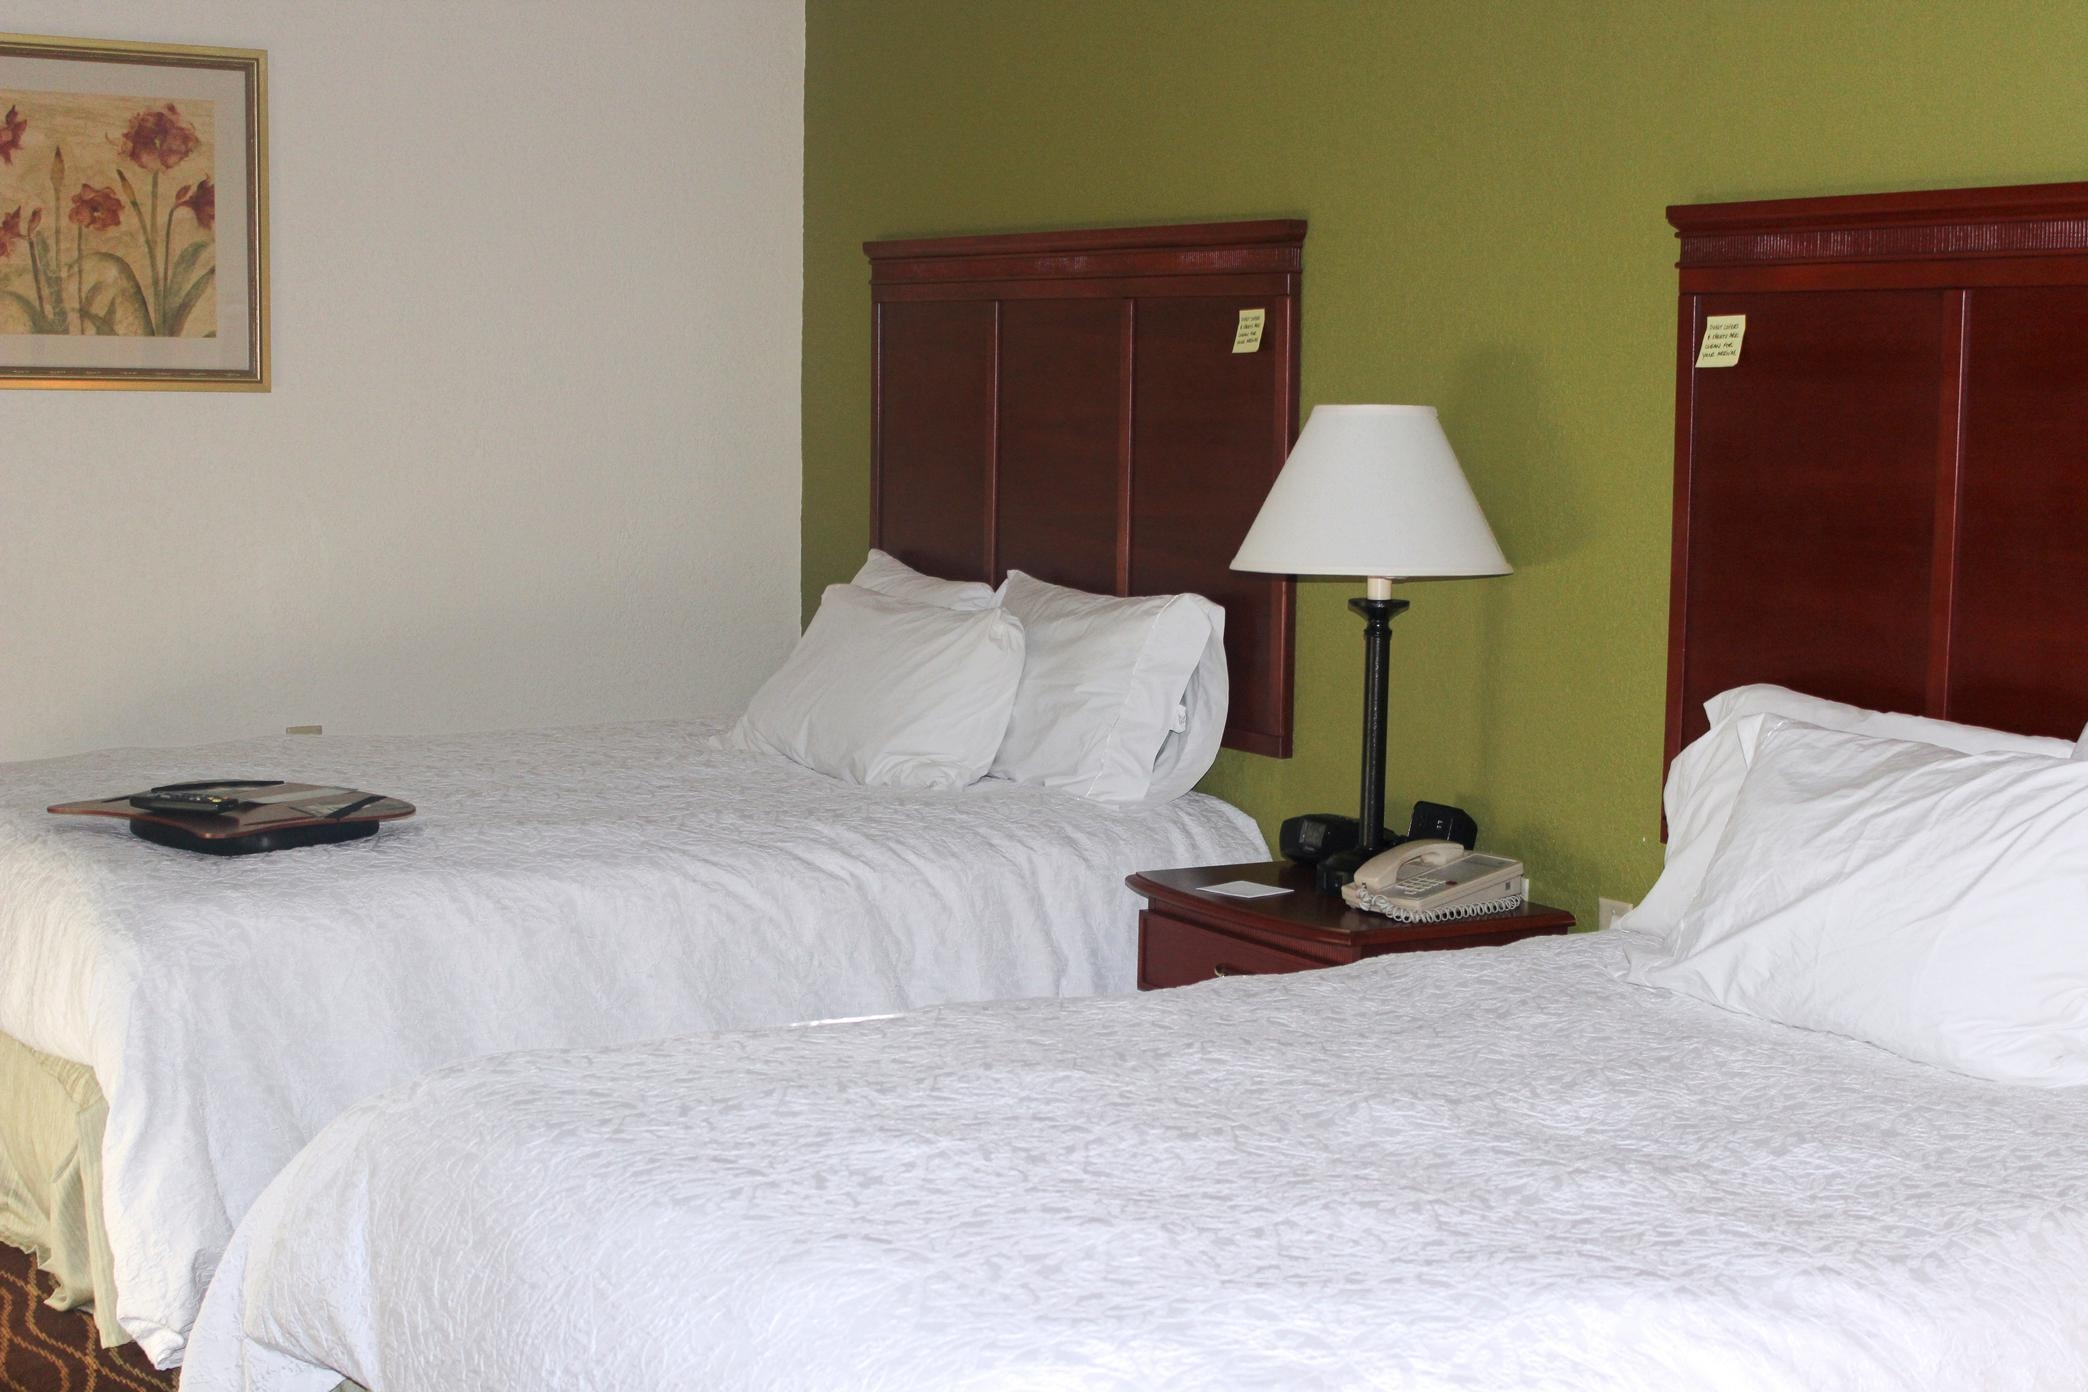 Hampton Inn & Suites Greenfield image 19